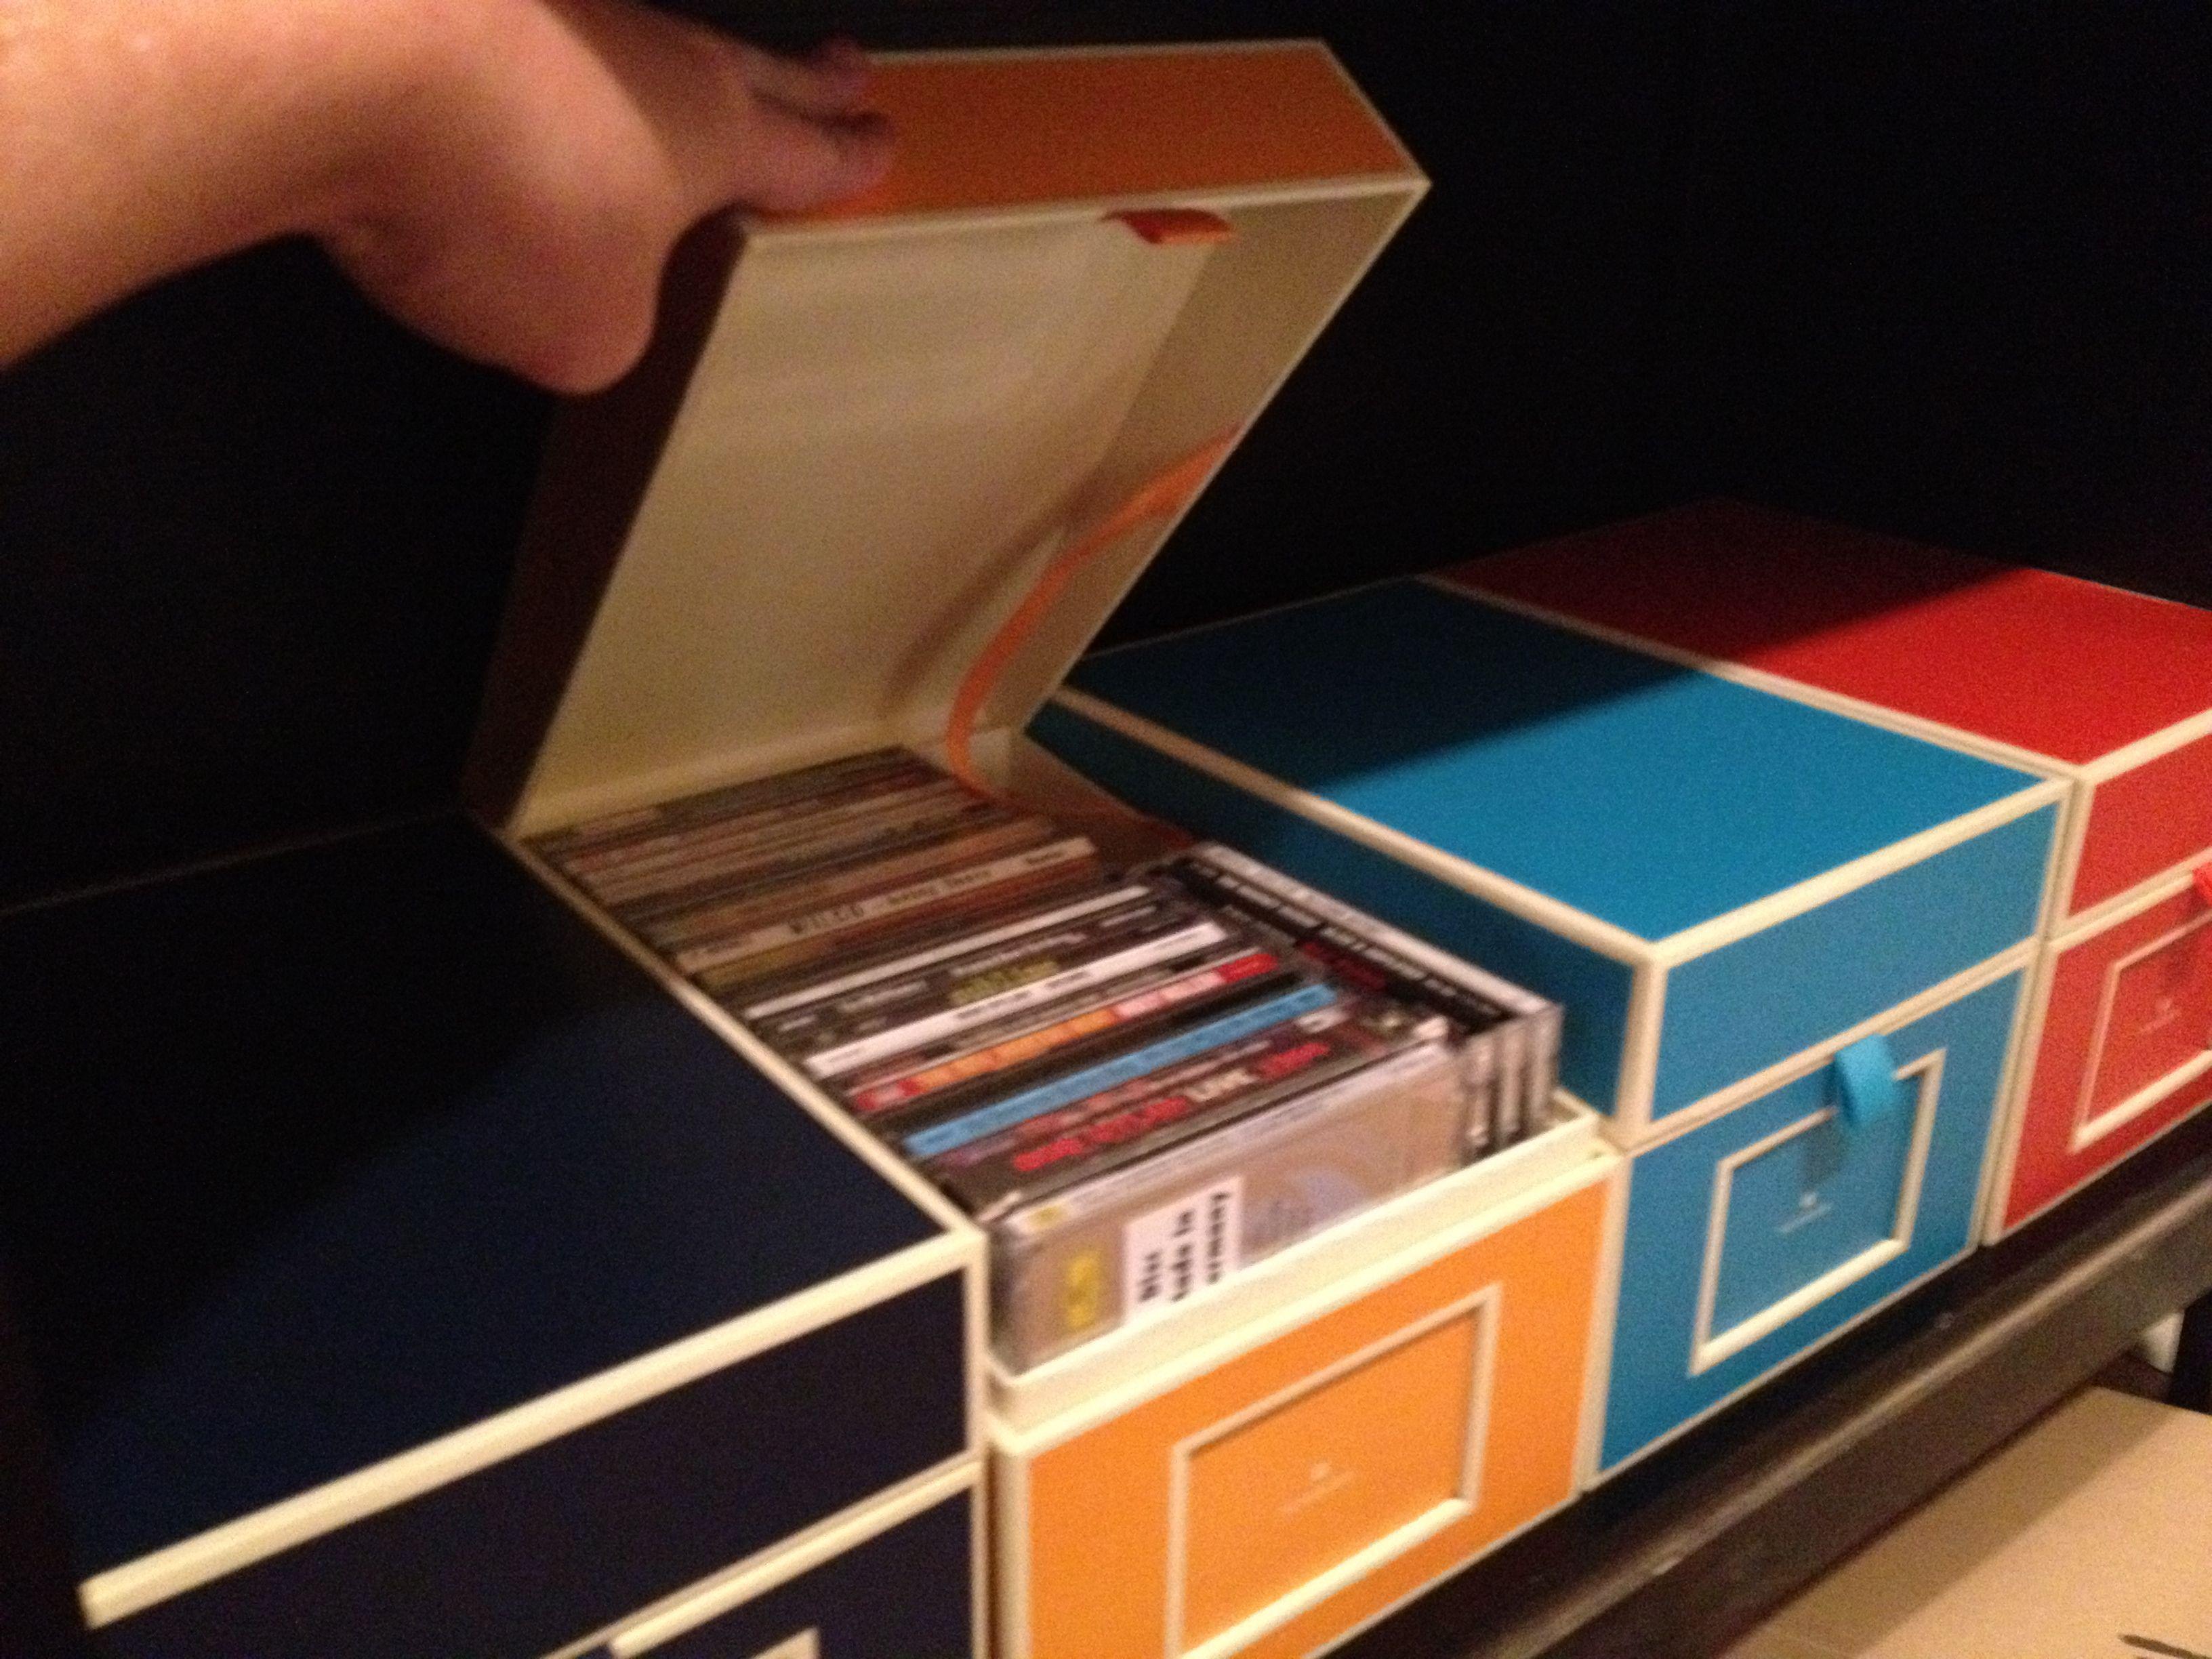 Vaultz Snap-N-Store CD Doublewide Storage Box Black